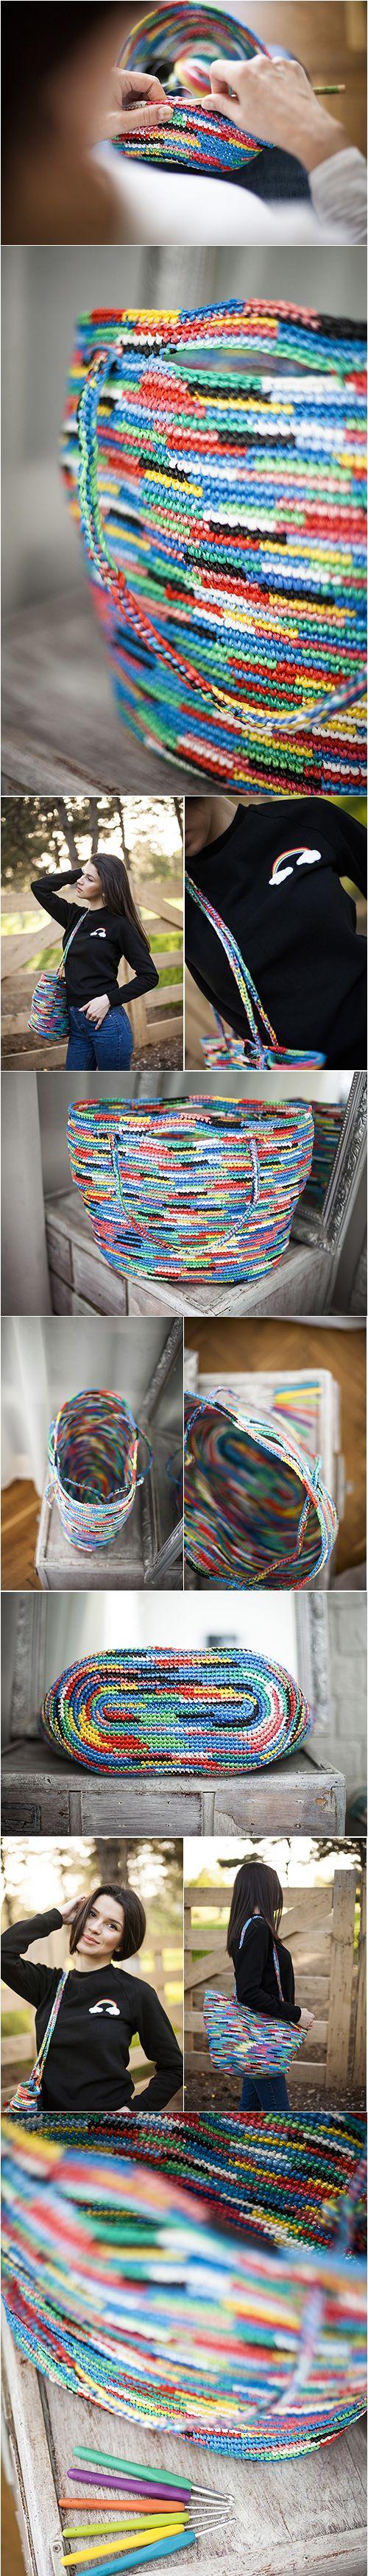 rainbow bag, plarn crochet tote, summer bag, upcycling, recycling, market bags